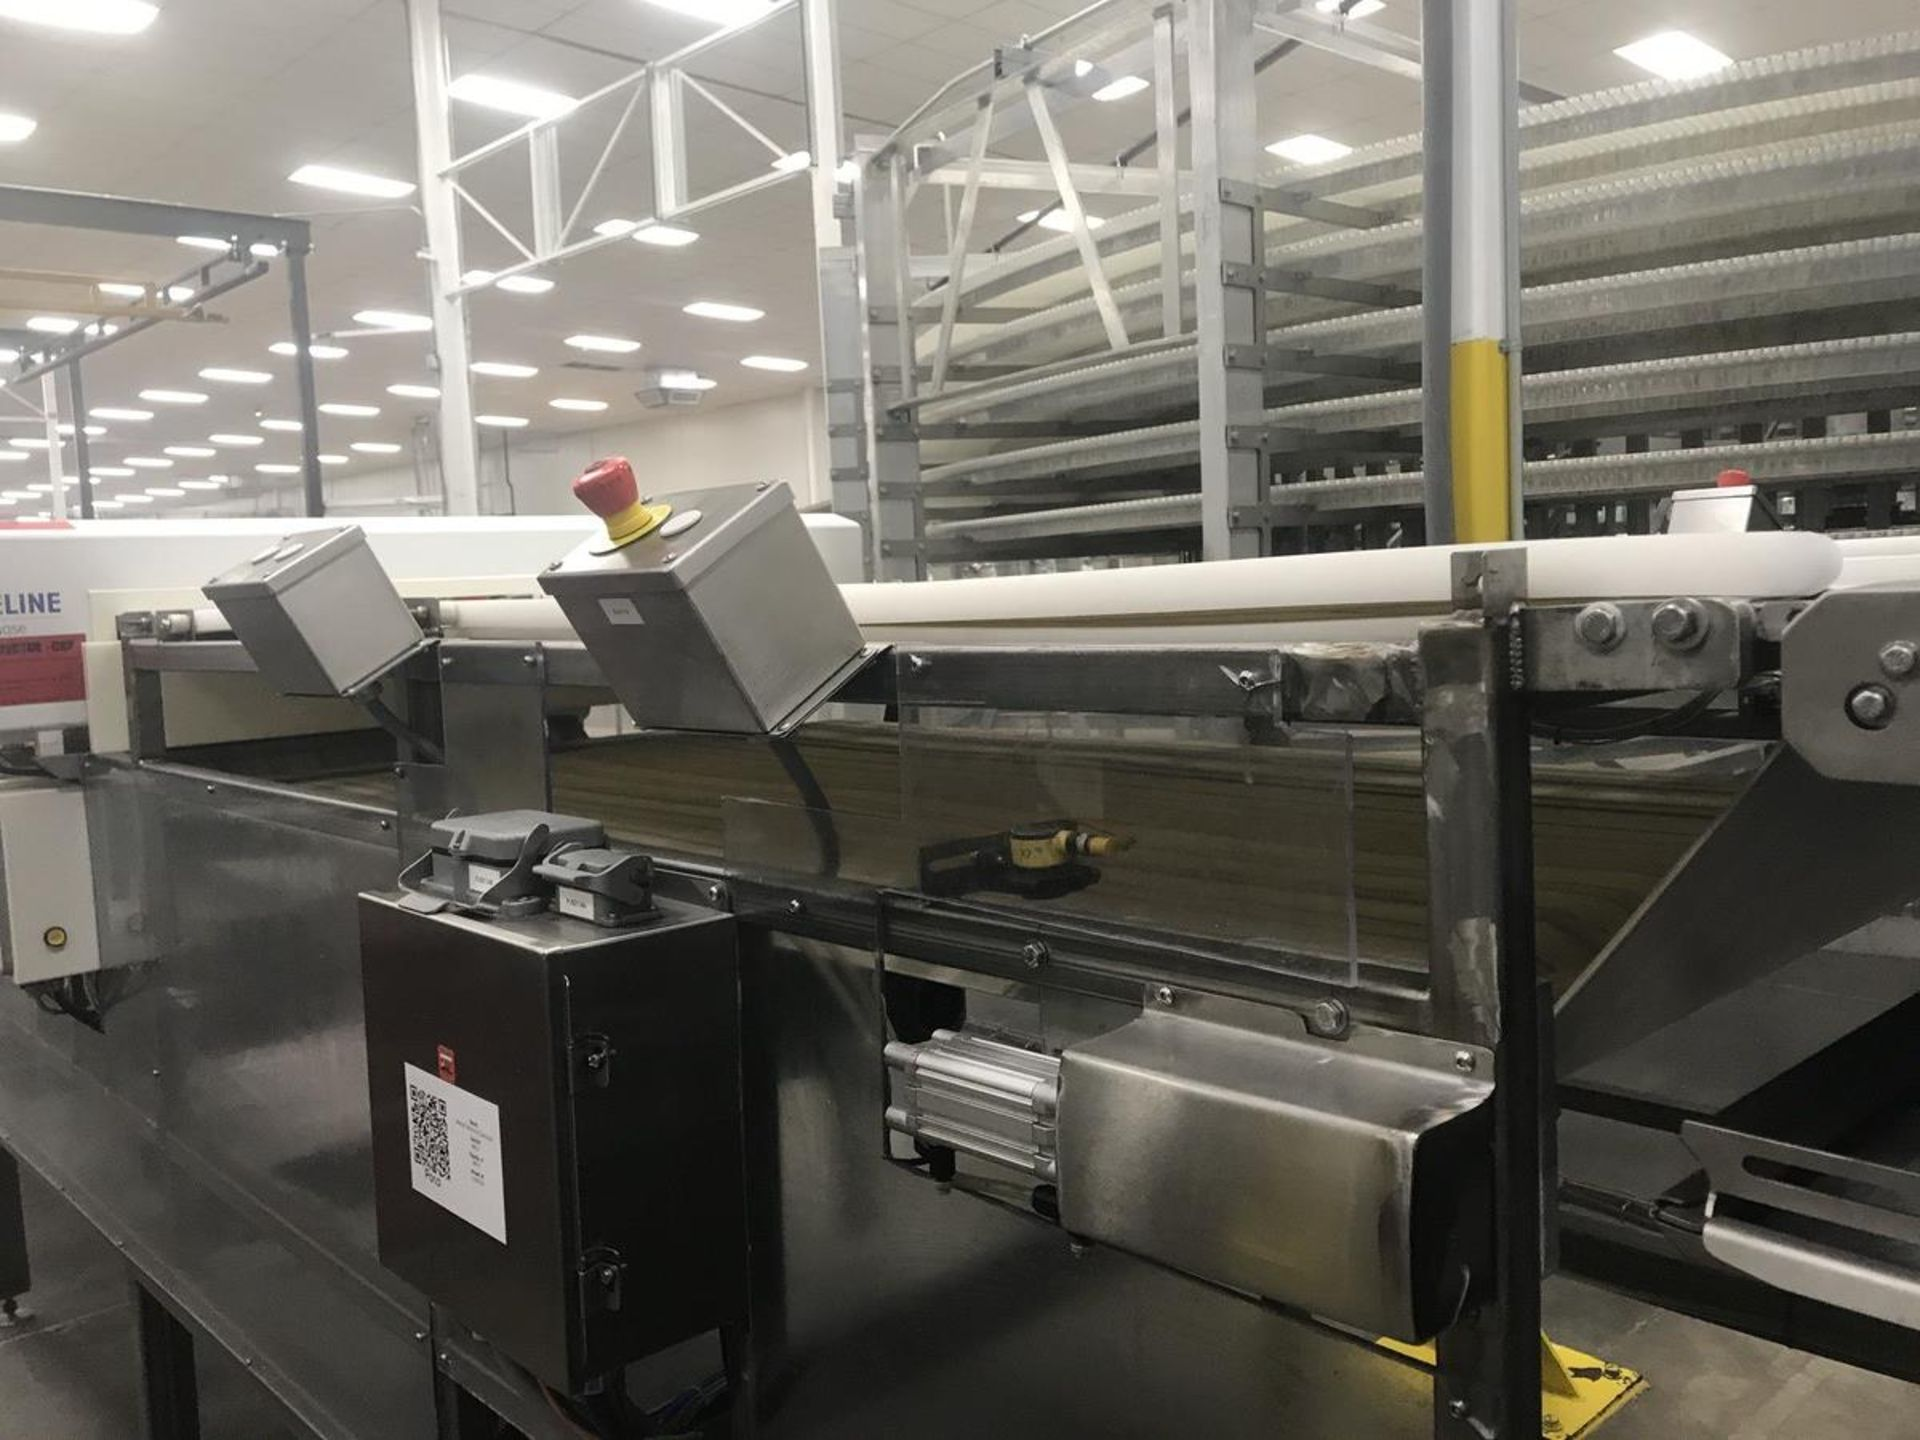 Lot 1N - 2008 Mettler Toledo Safeline PowerPhase Slab Metal Detector with Conveyor, 53in x 2in Aperture, Conv